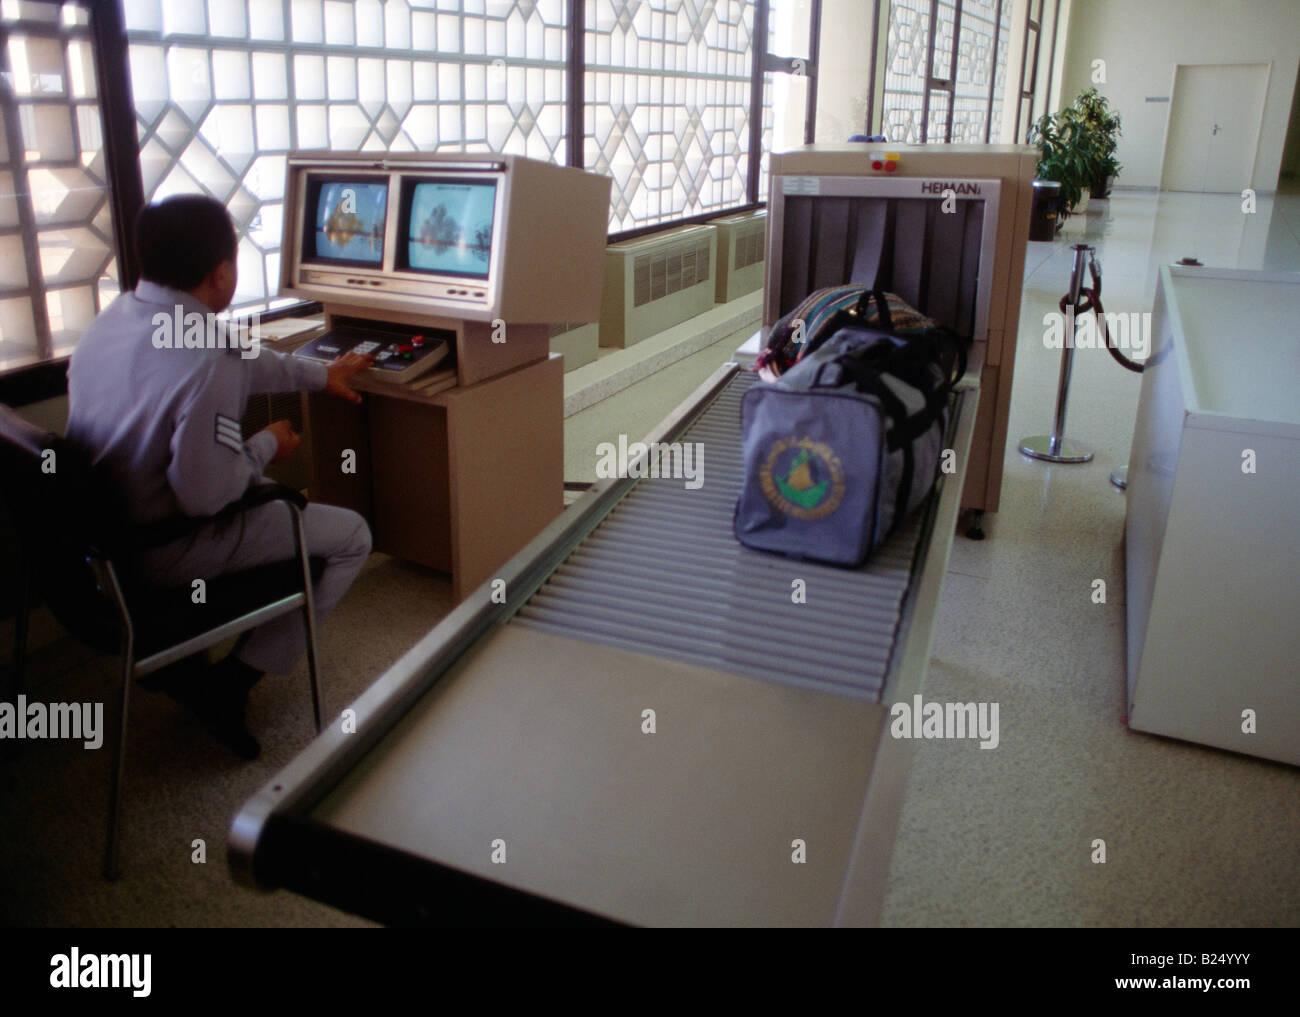 Abu Dhabi UAE International Airport Baggage Security Check X-ray Scanners Stock Photo